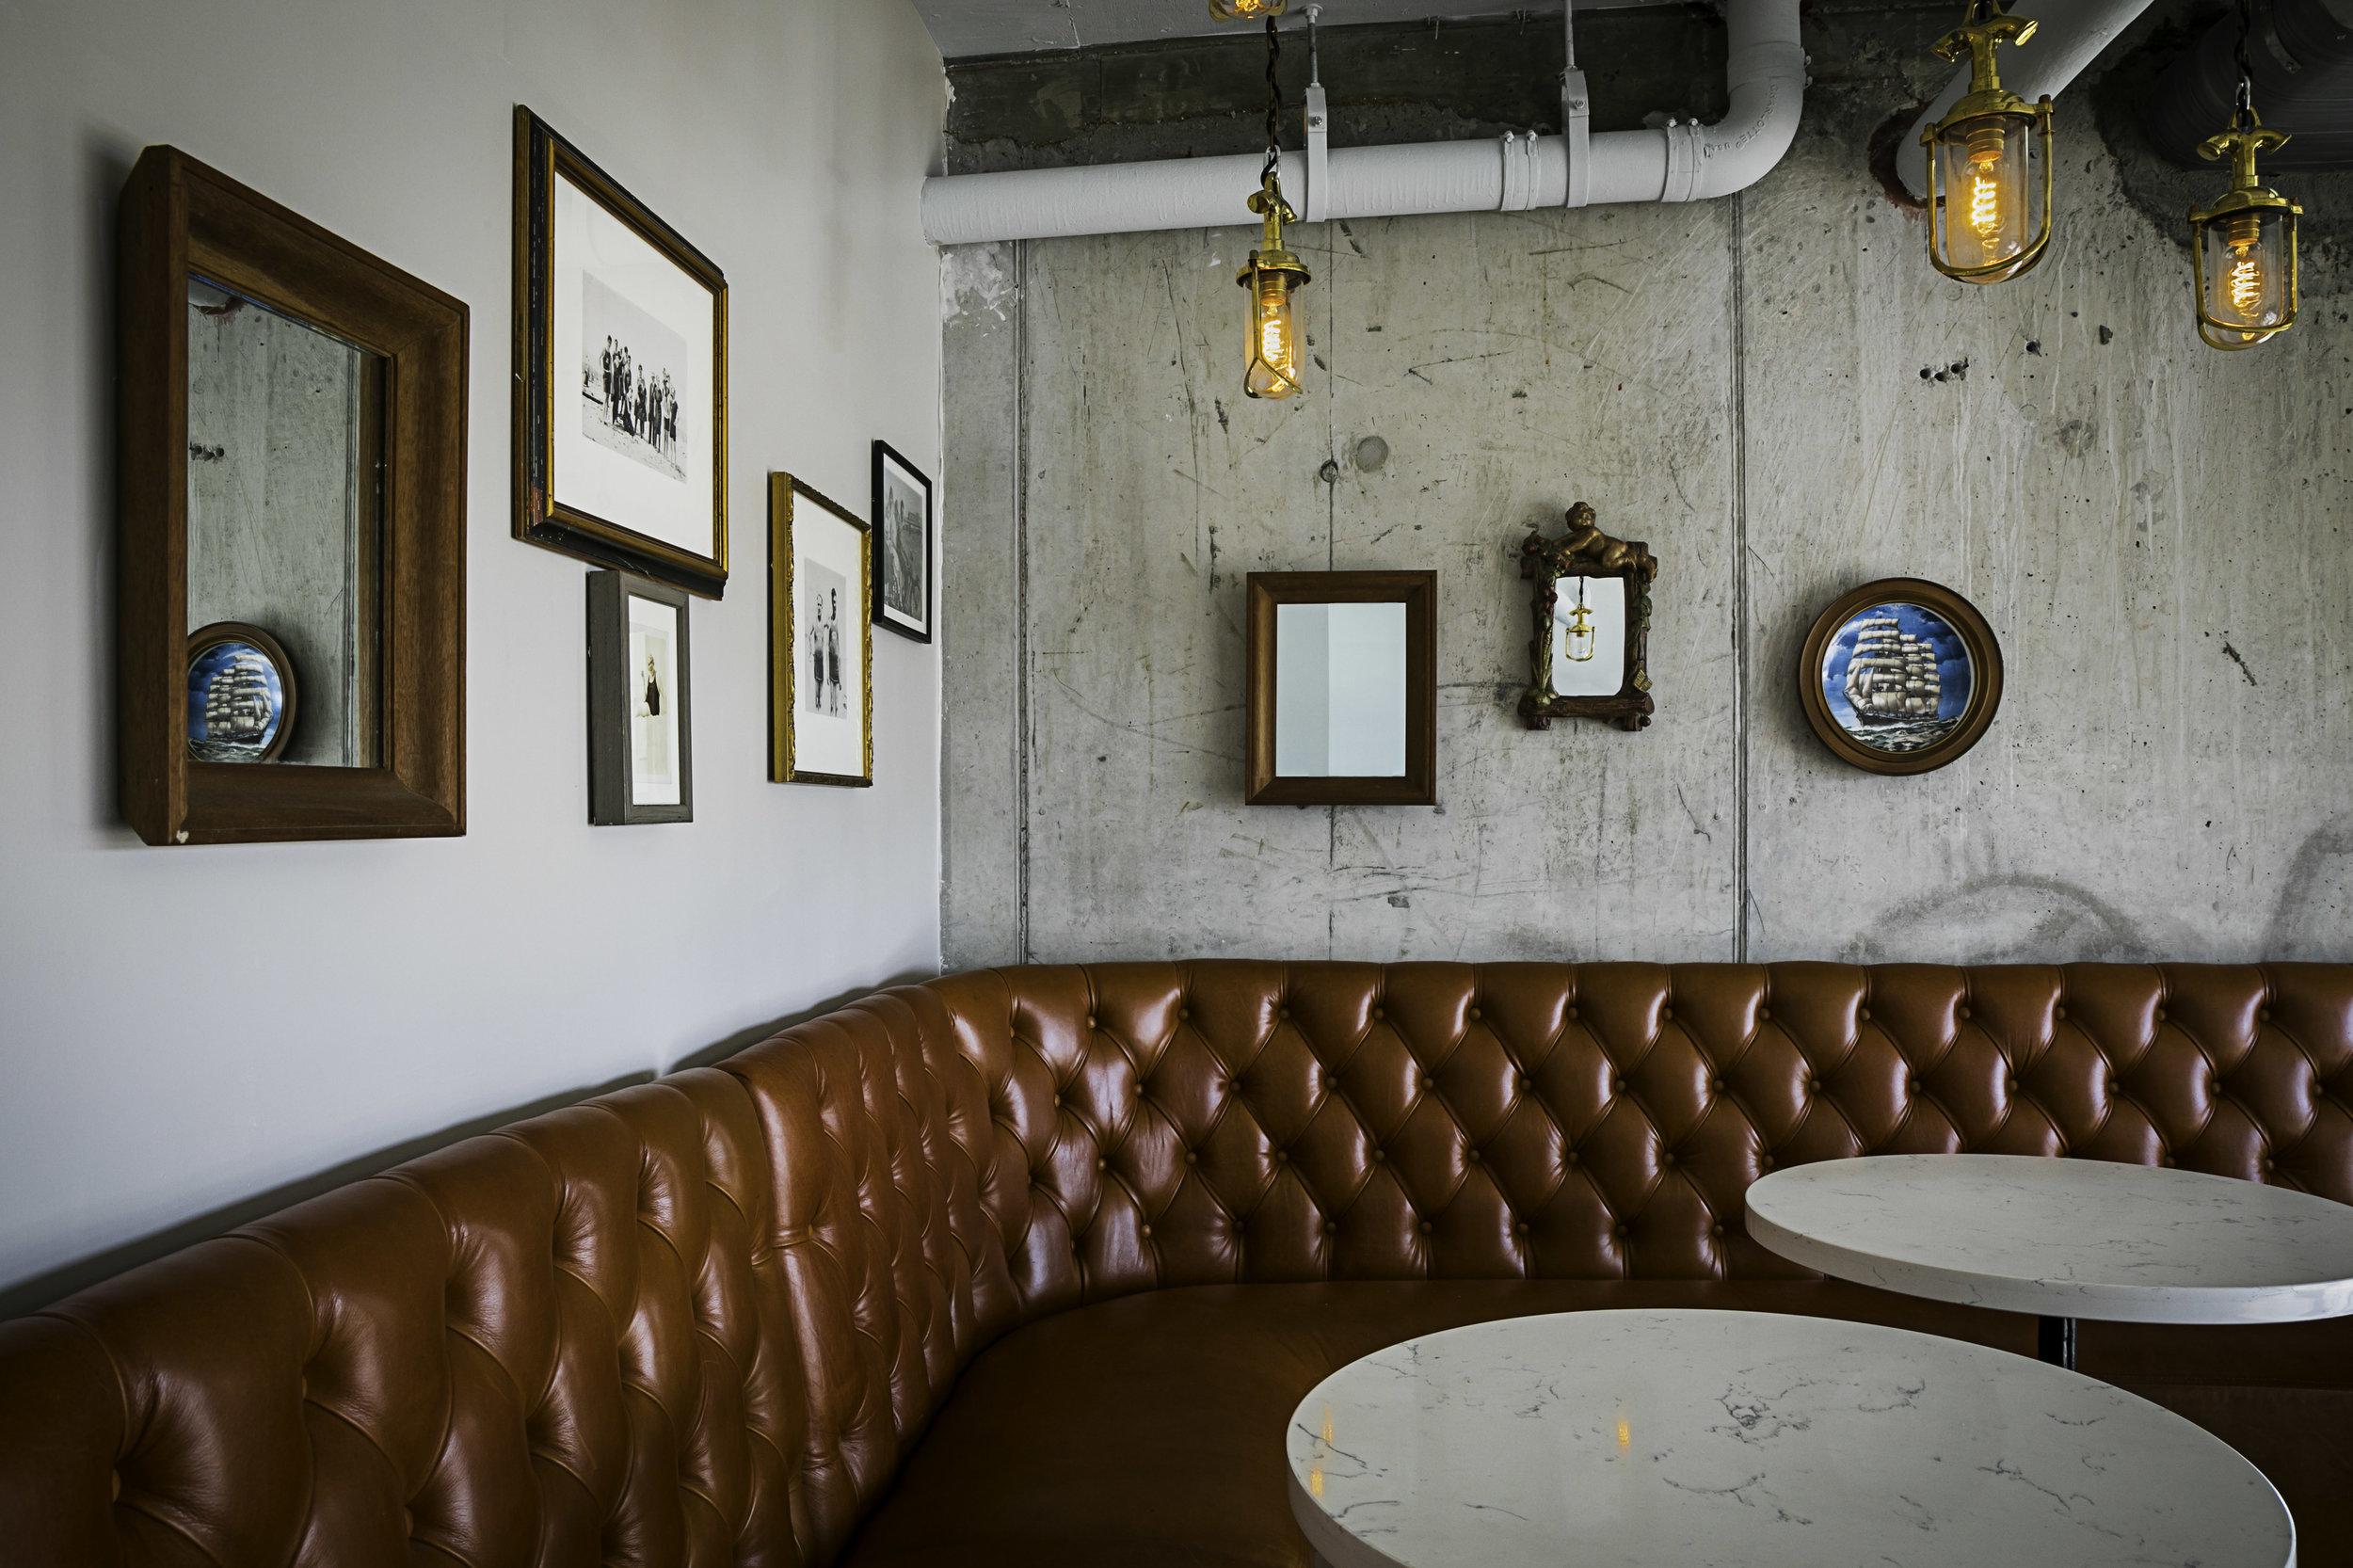 studio-saint-bars-and-restaurants-the-brighton-washington-dc-3